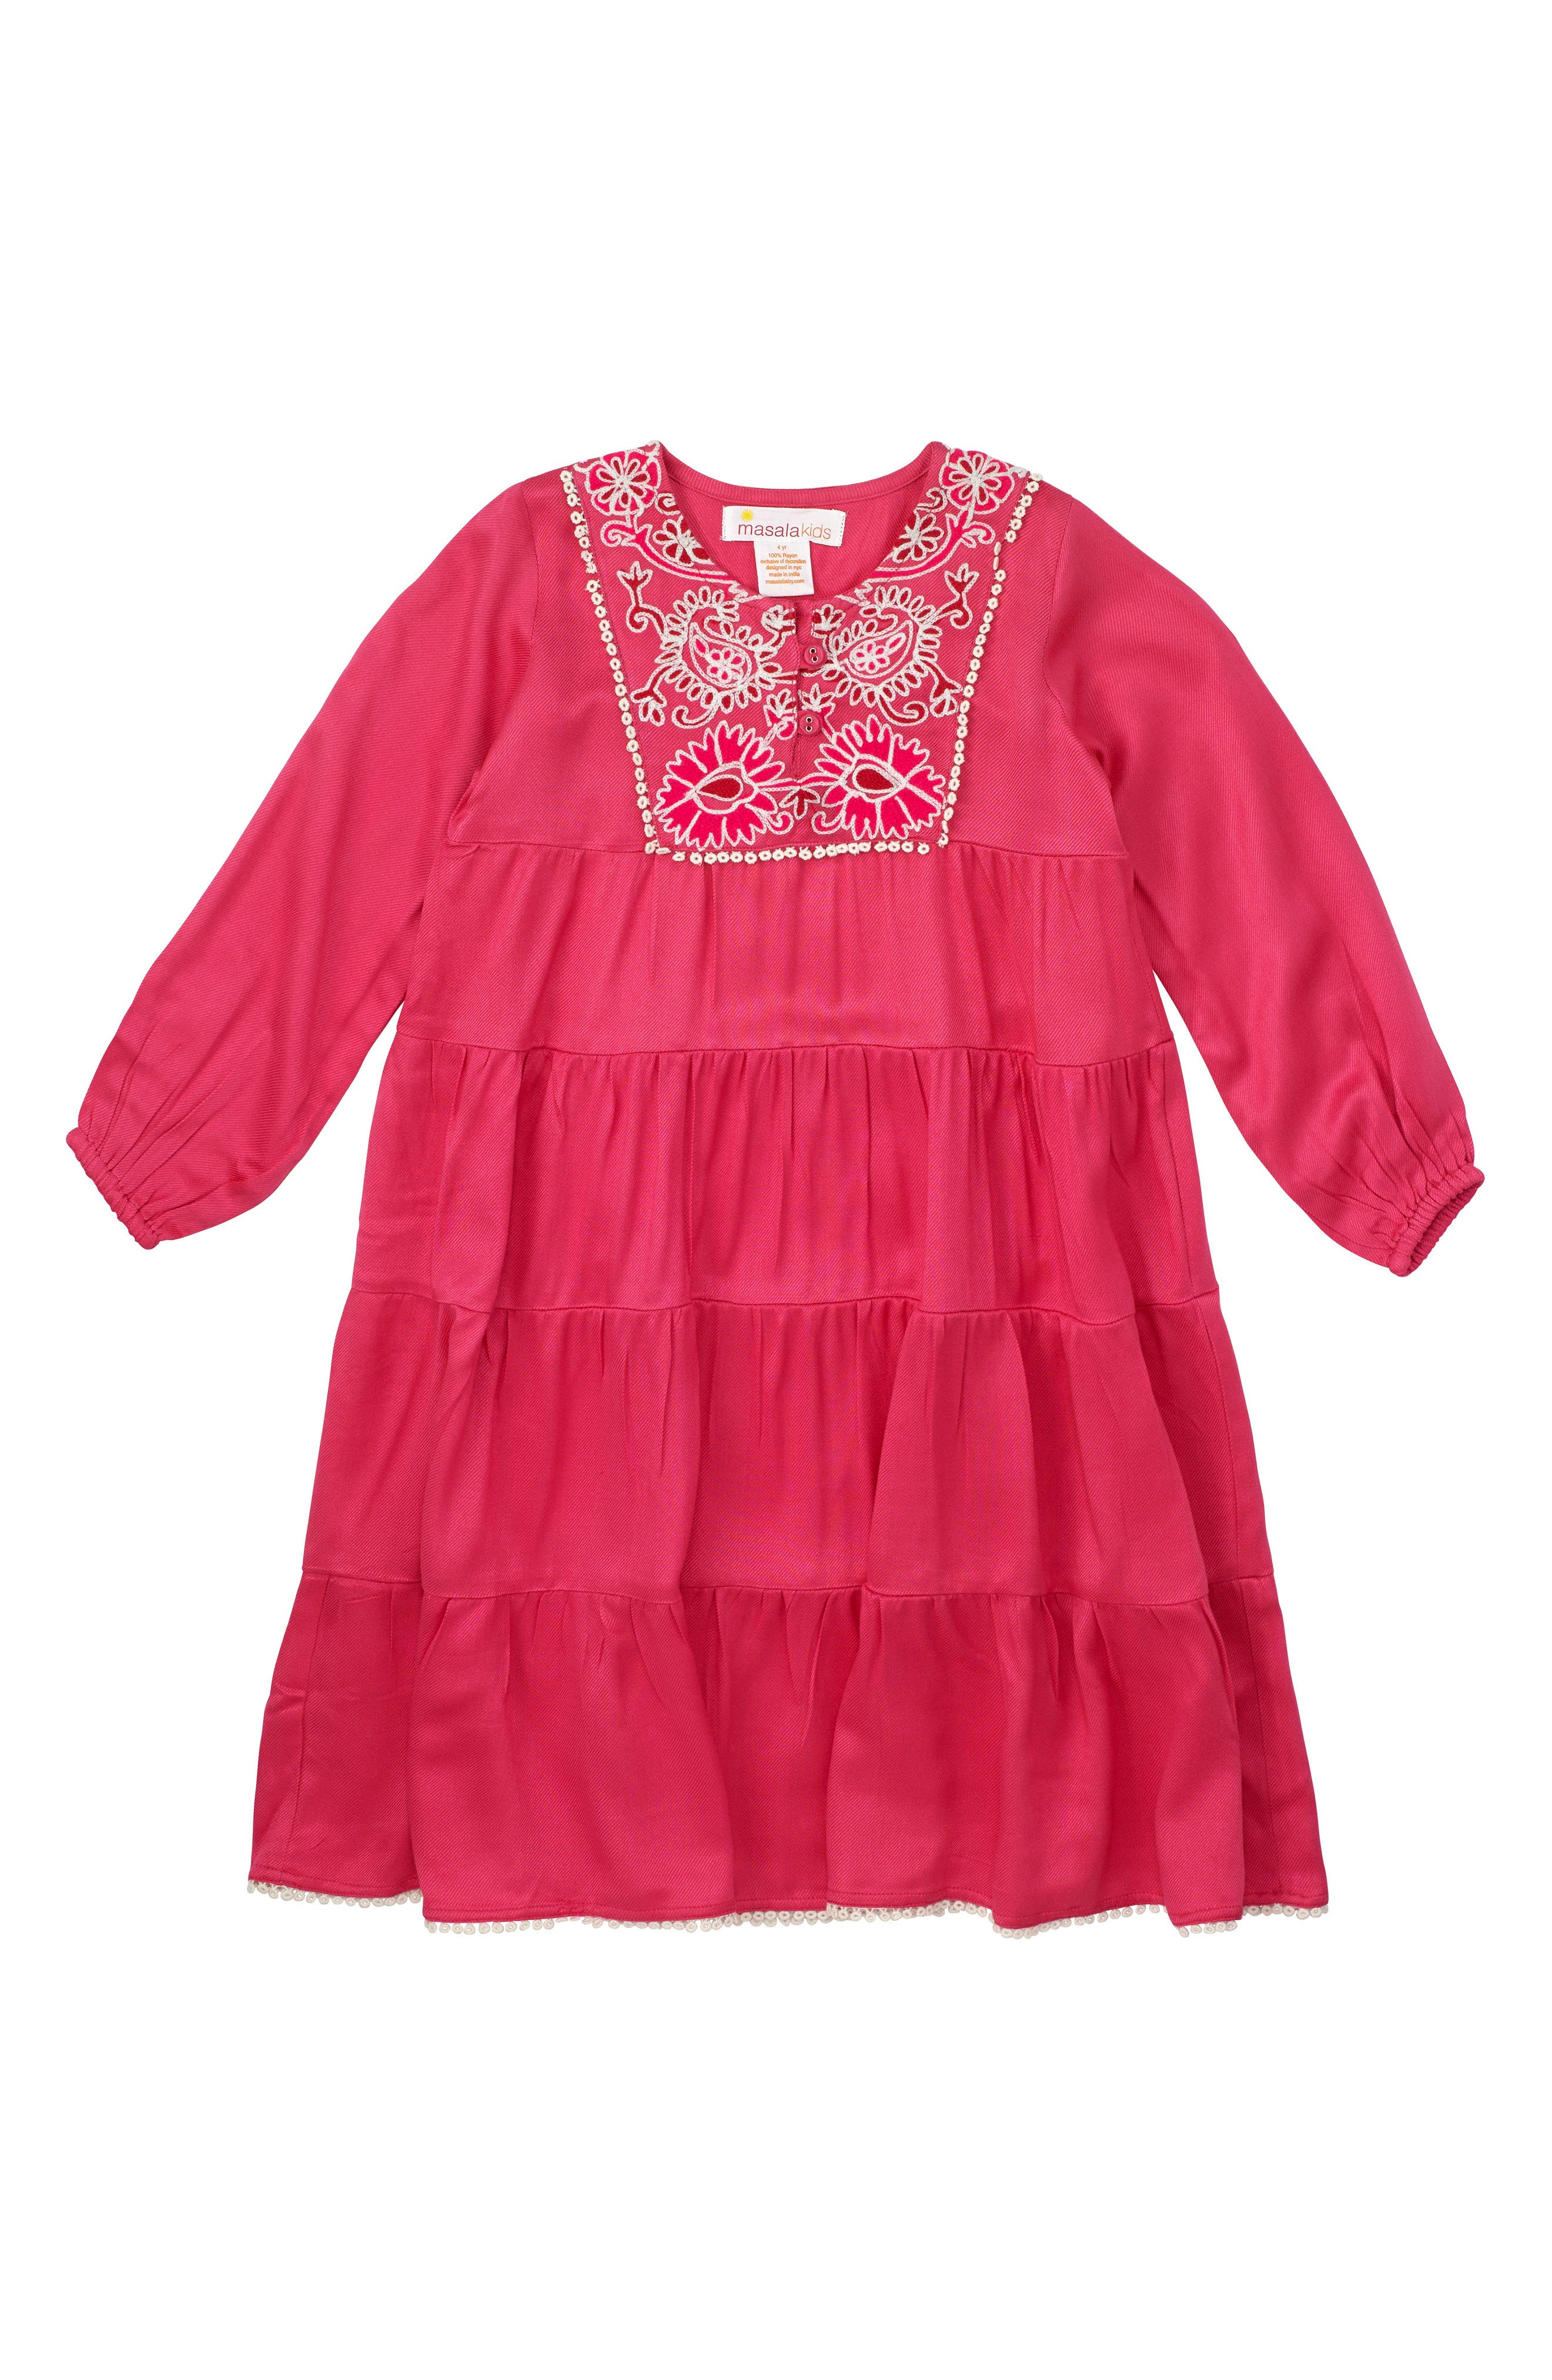 Rose Dress,                         Main,                         color, Pink